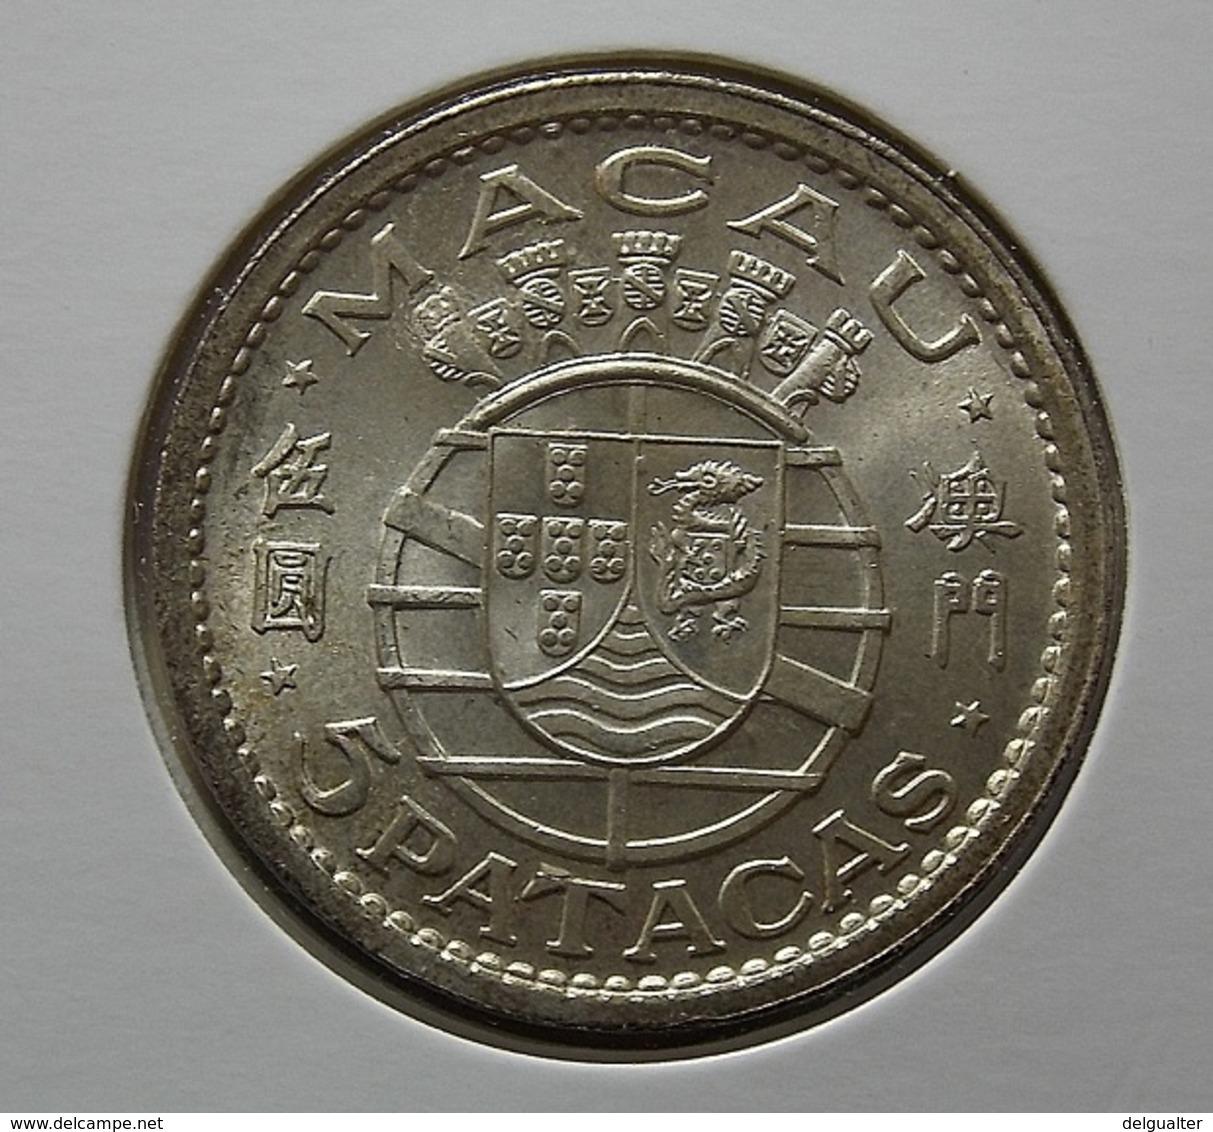 Portugal Macau 5 Patacas 1952 Silver - Portugal